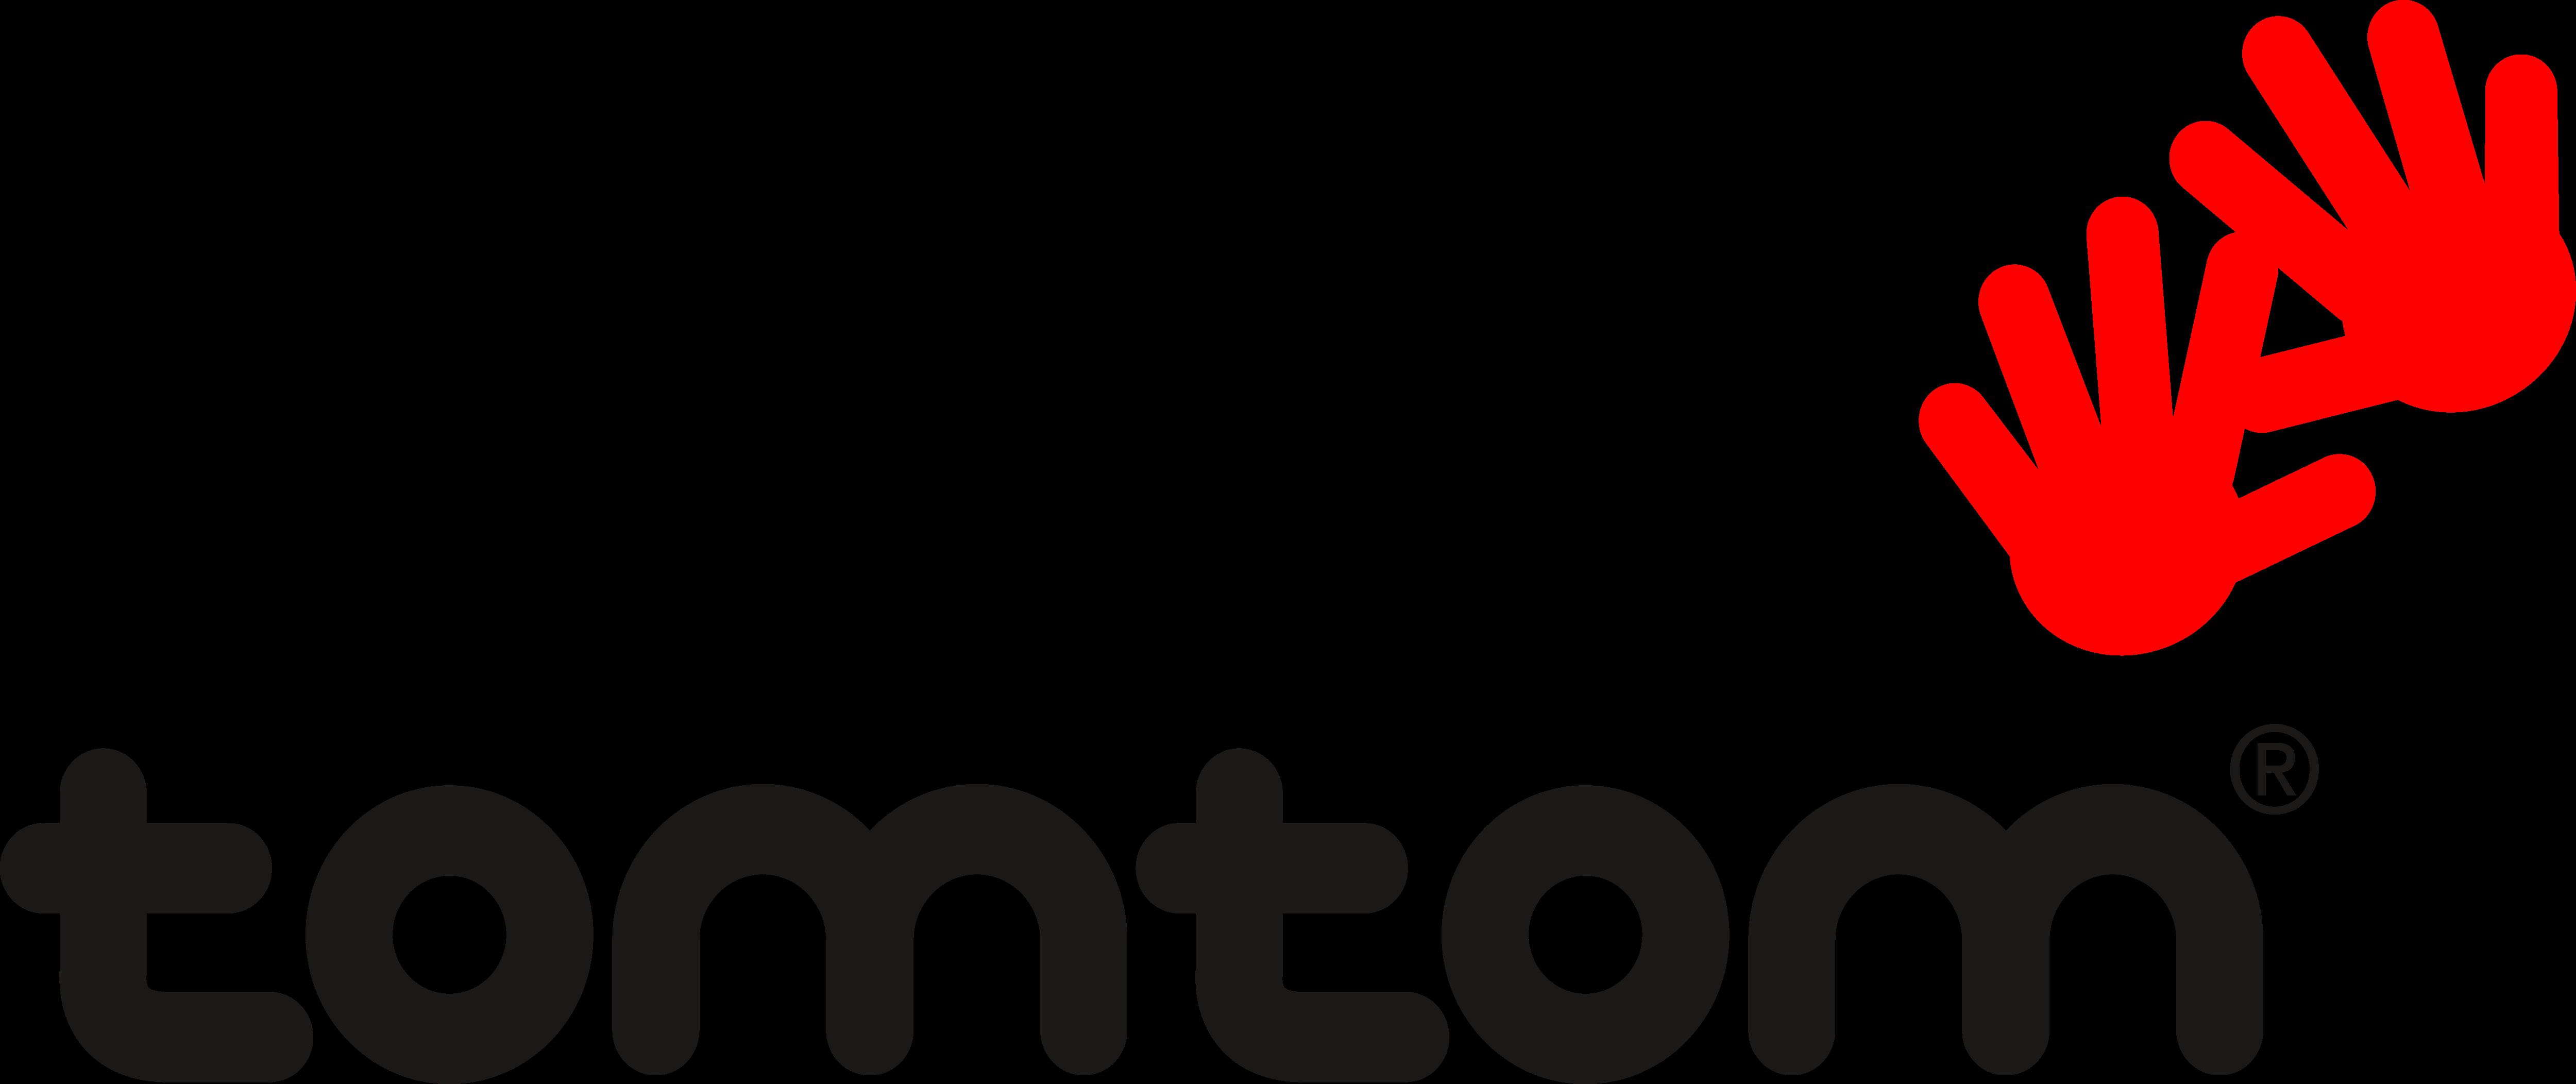 Tomtom Logos Download